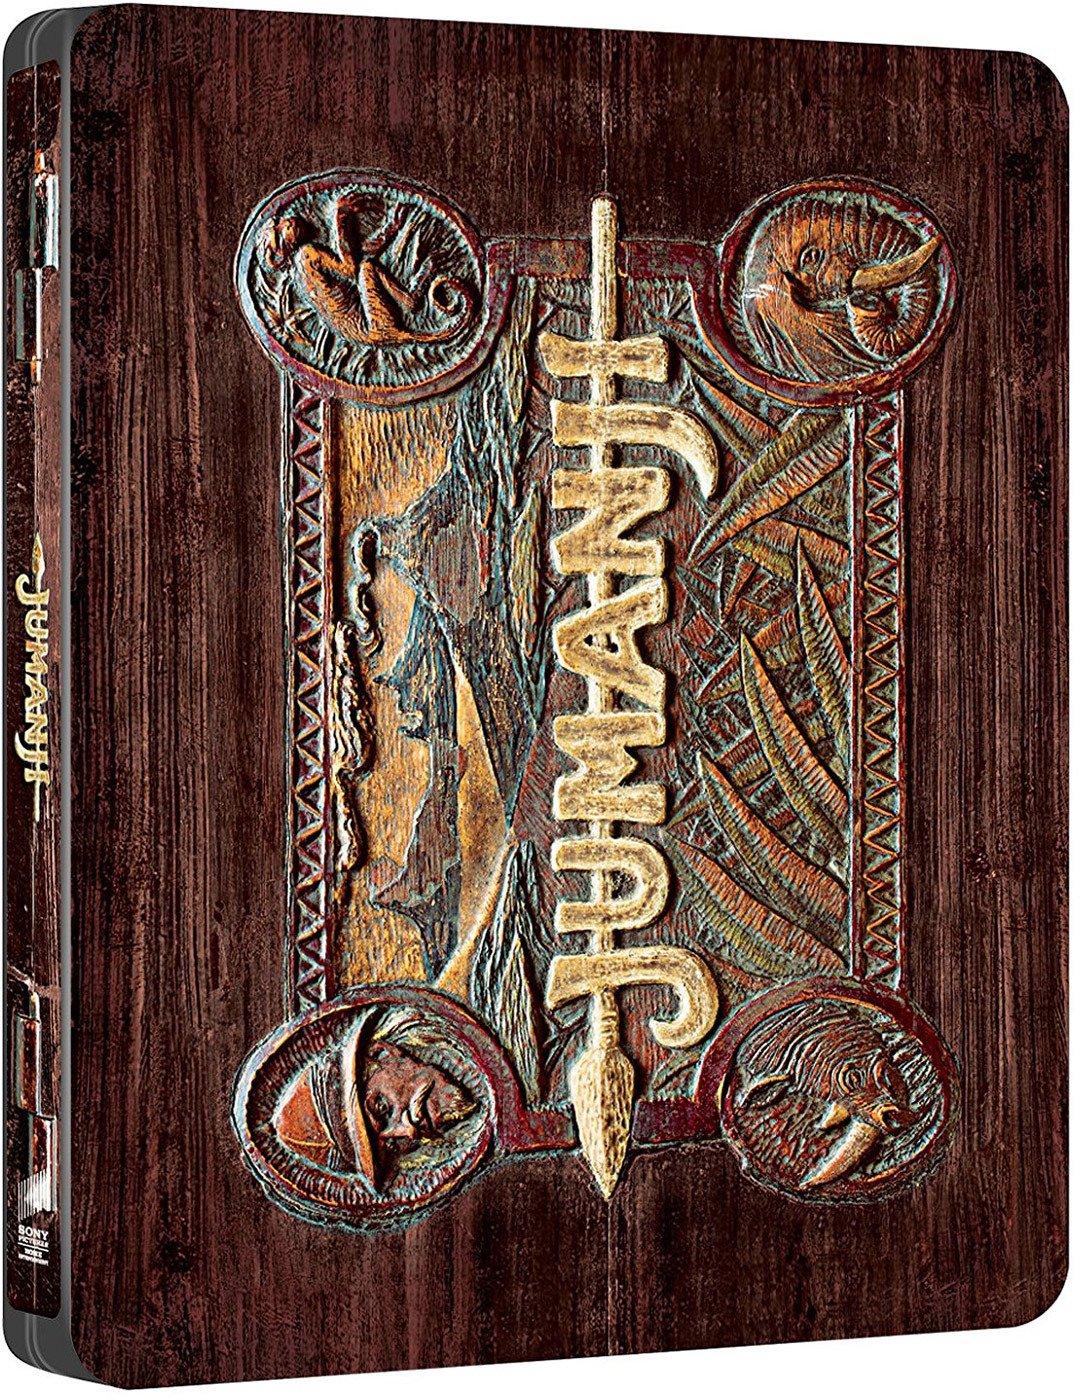 Jumanji 1995 - Edición Metálica [Blu-ray]: Amazon.es: Robin ...